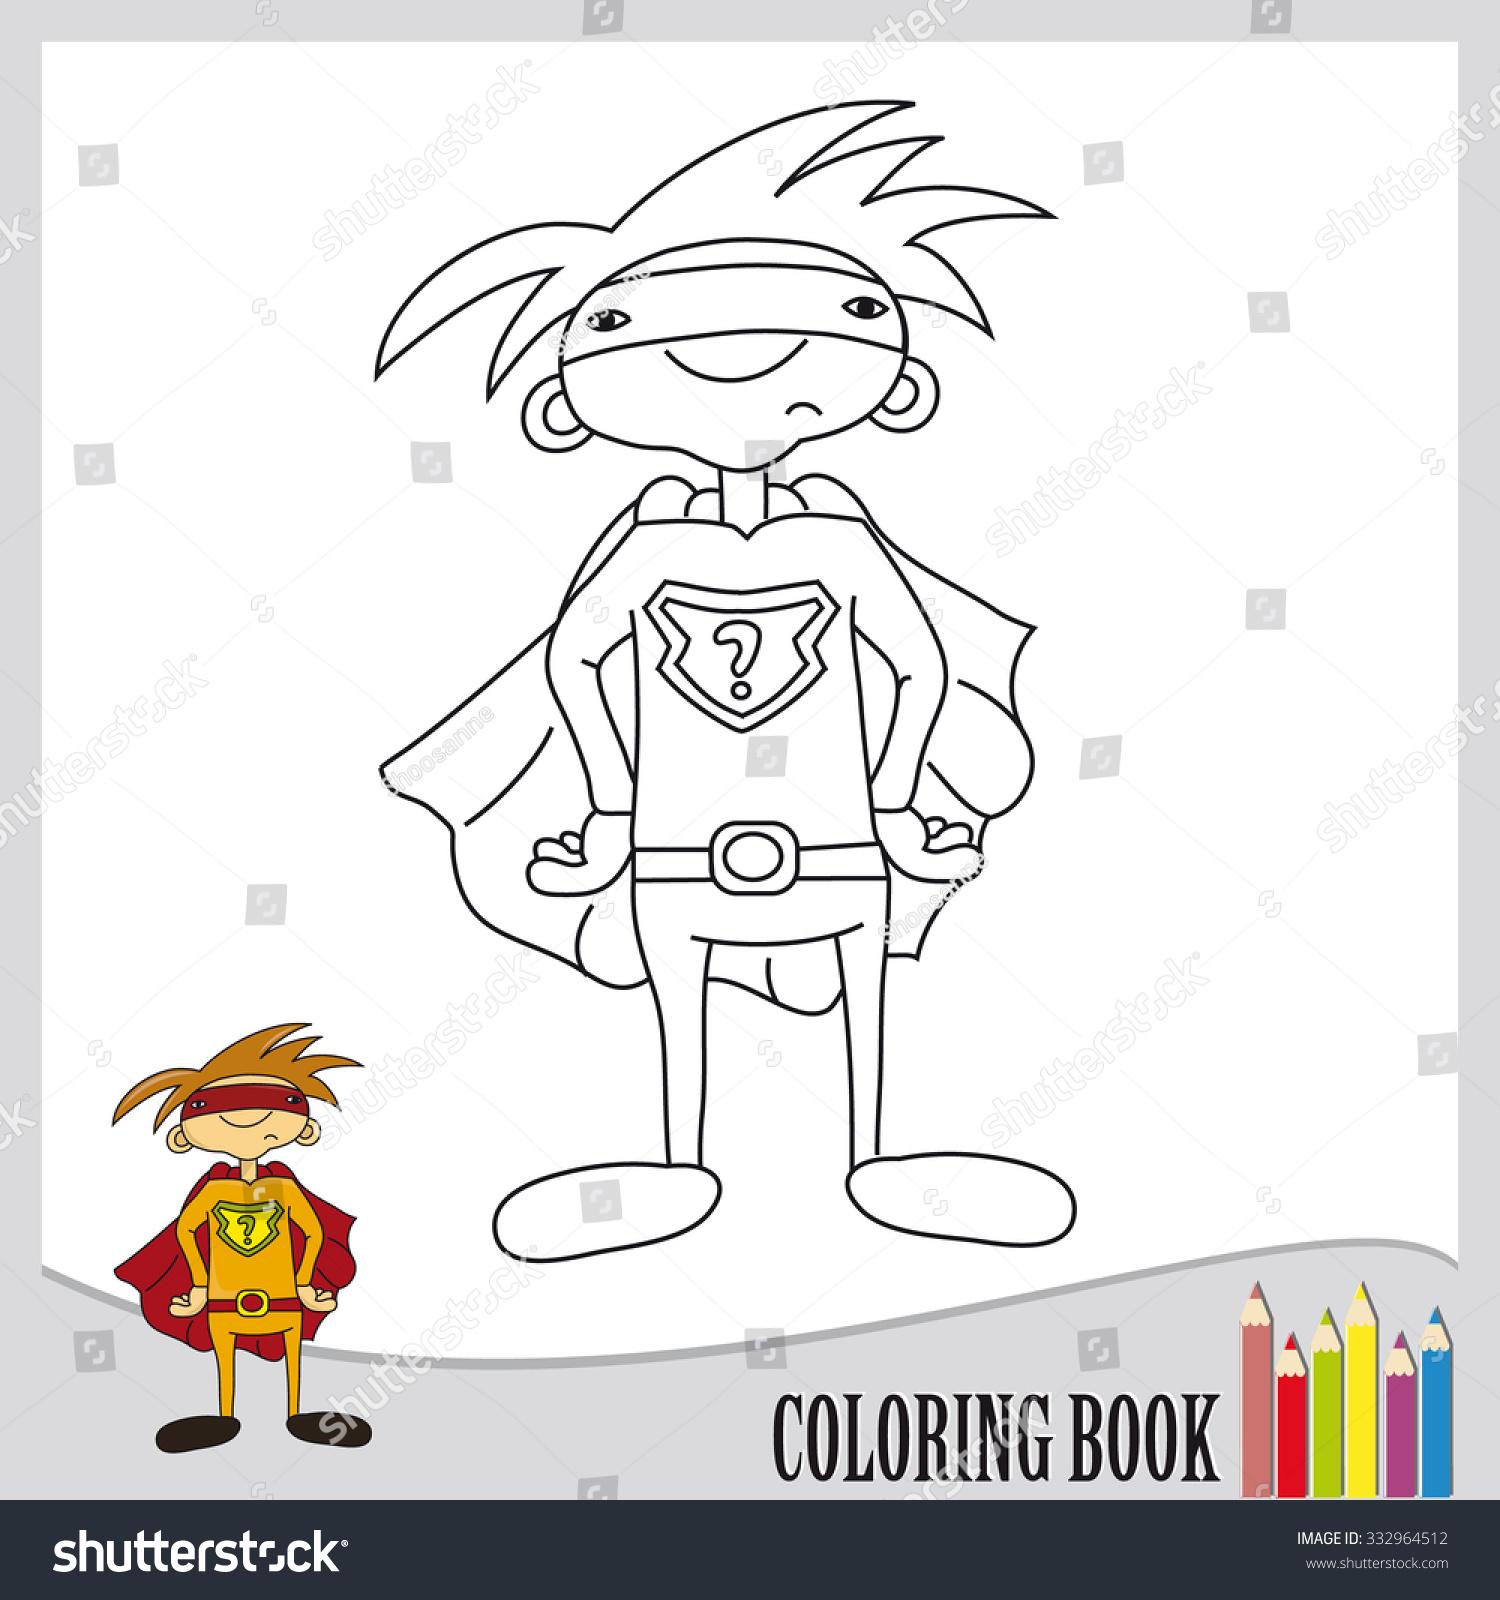 Coloring Book Superhero Orange Outfit Vector Stock